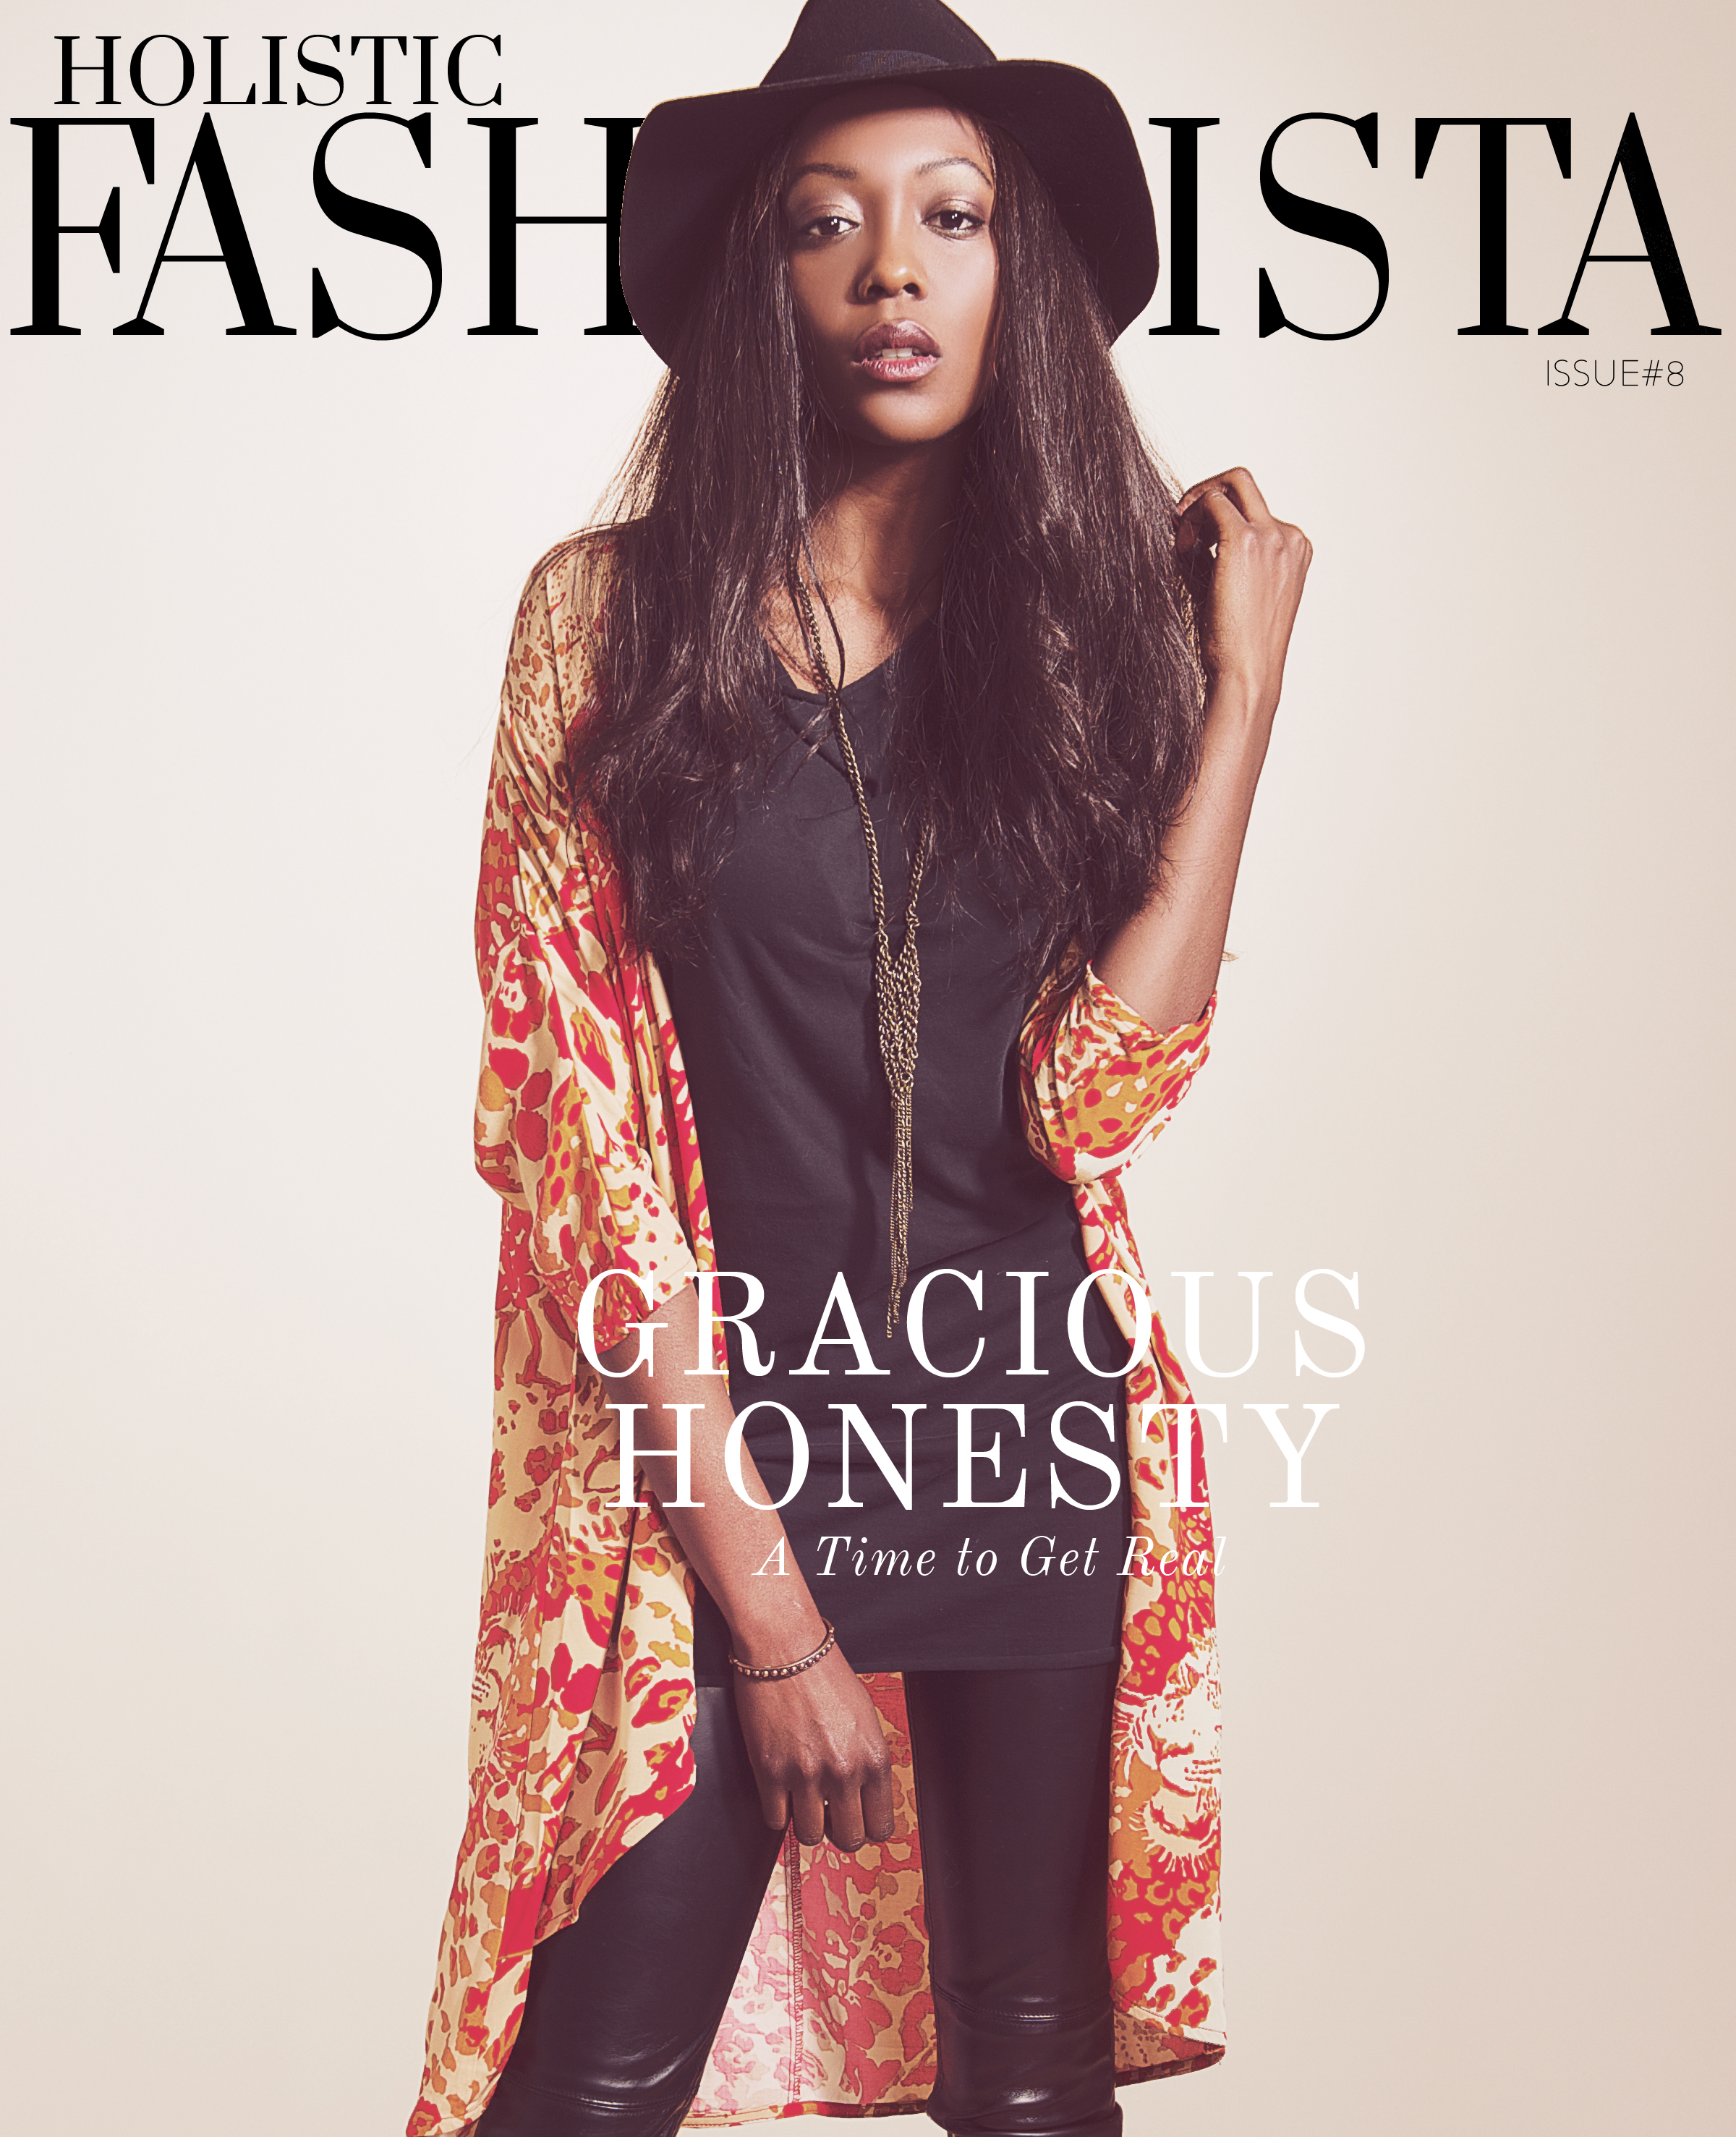 Holistic Fashionista Magazine: Issue #7